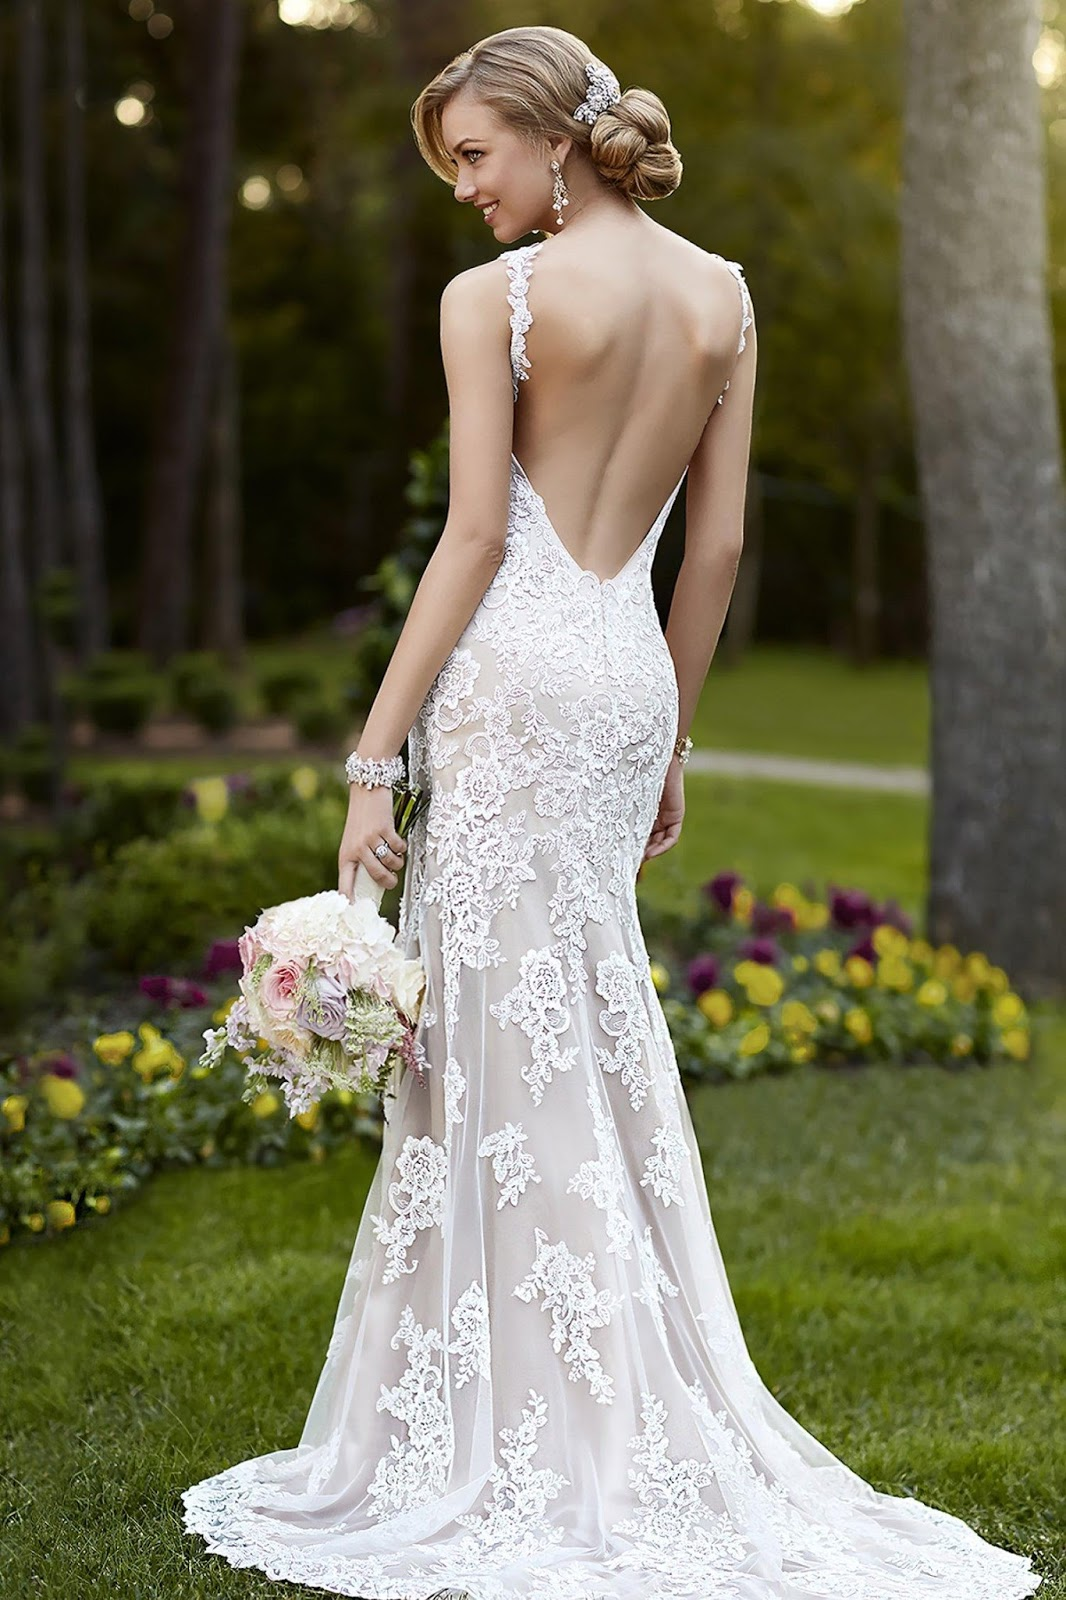 crochet wedding dress patterns free INSRAQG